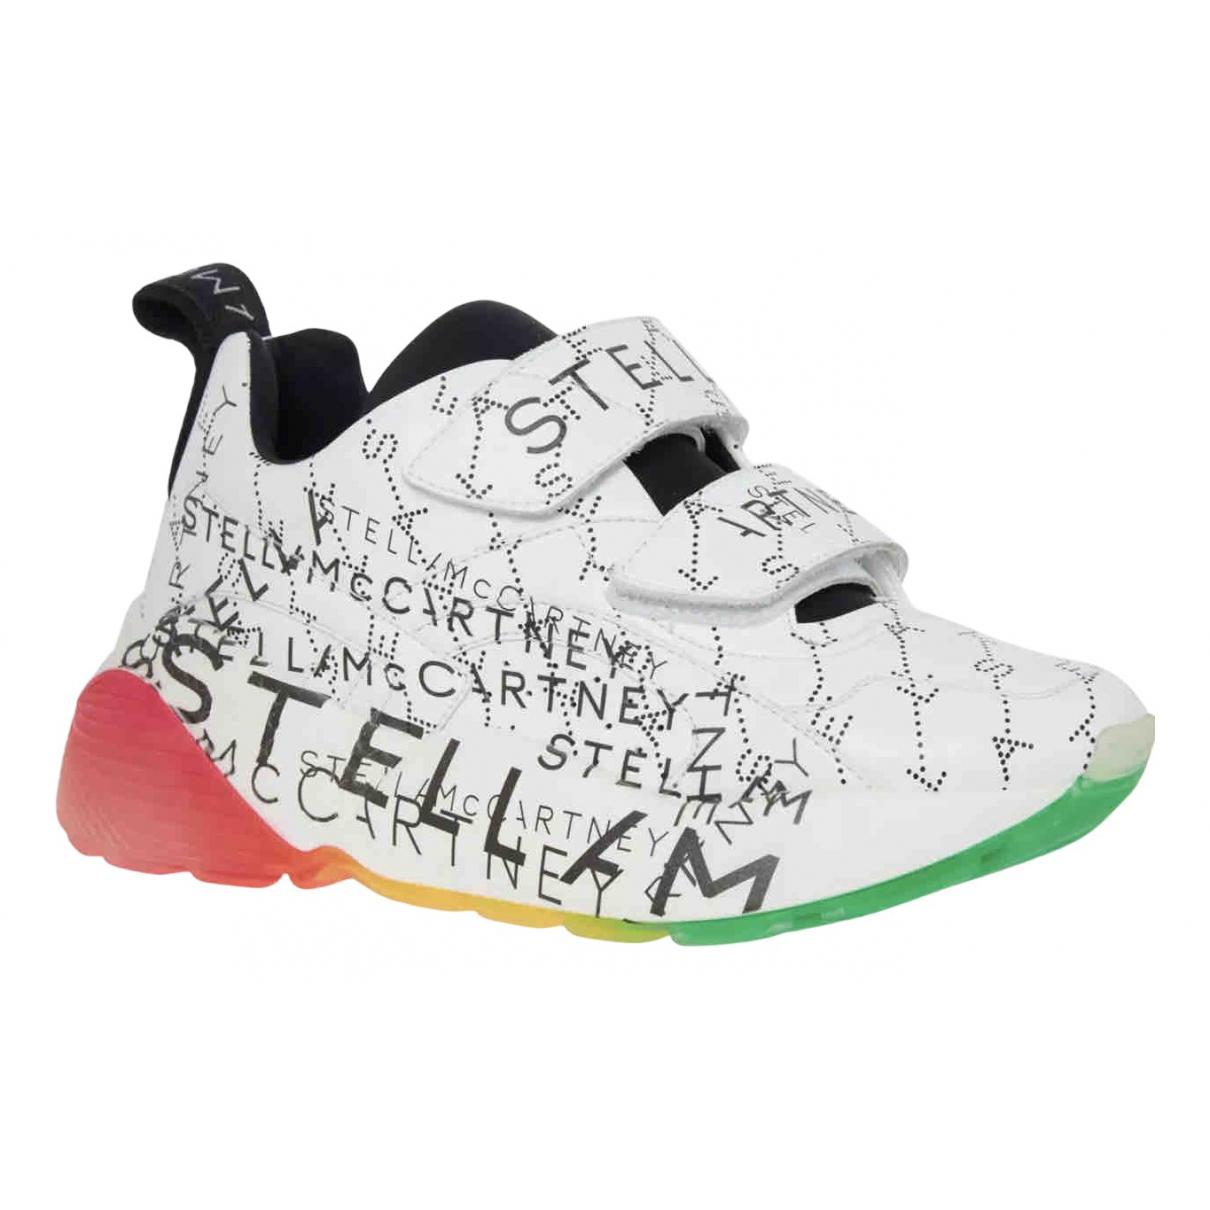 Stella Mccartney - Baskets Eclypse pour femme - blanc